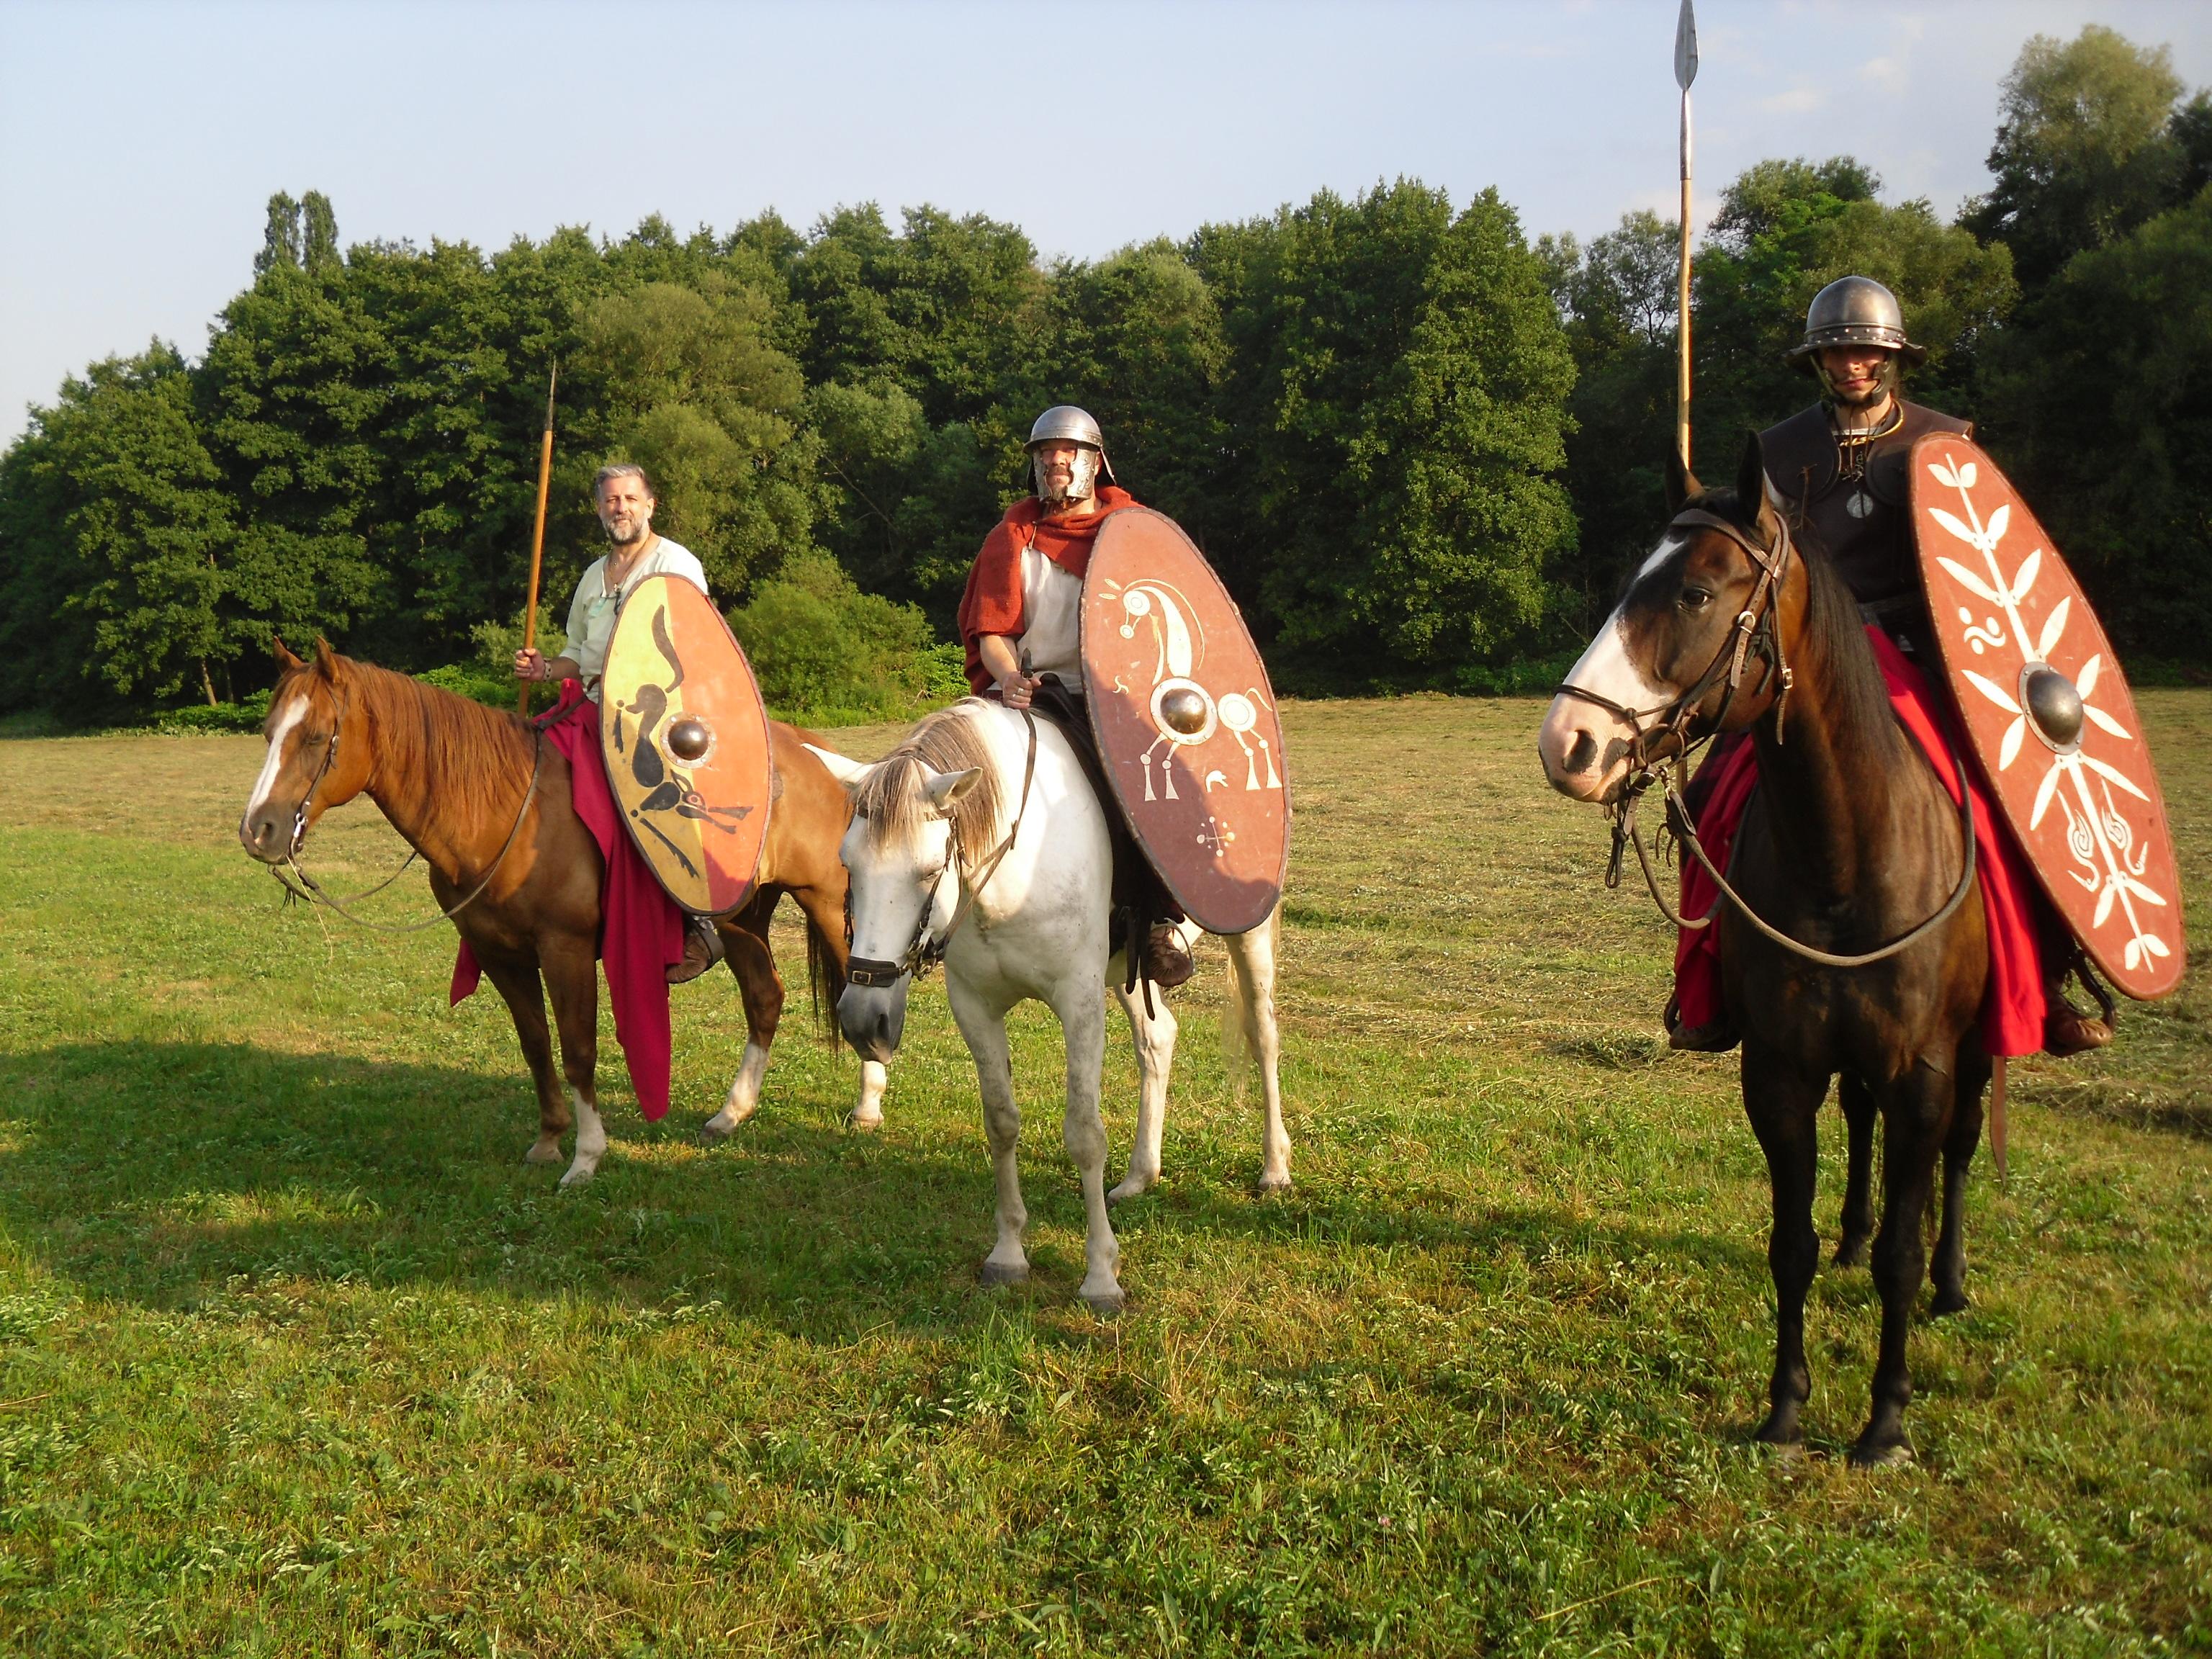 Le commandement de la cavalerie Mediomatrici